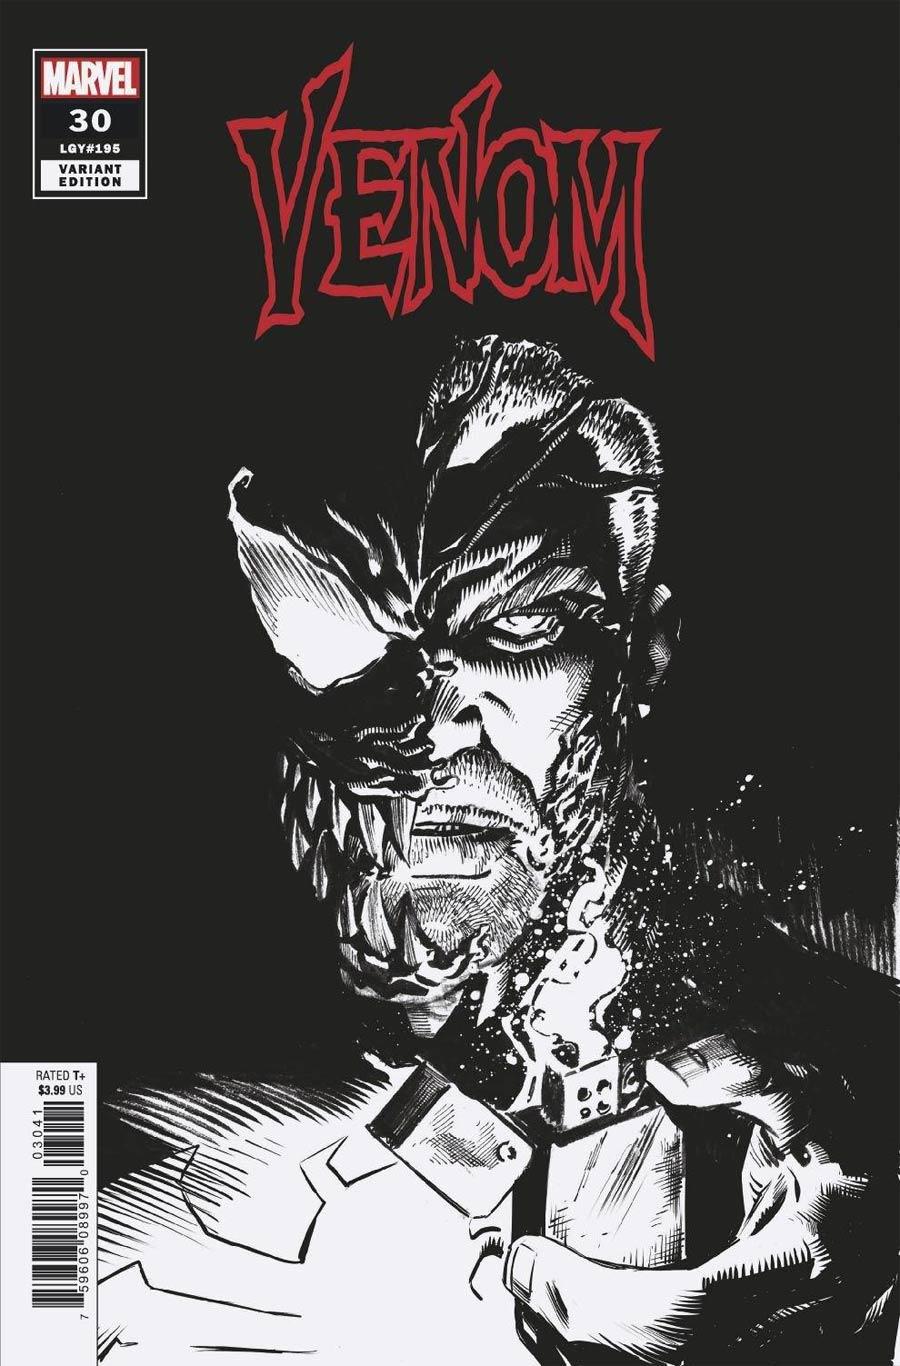 Venom Vol 4 #30 Cover D Incentive Ryan Stegman Sketch Cover